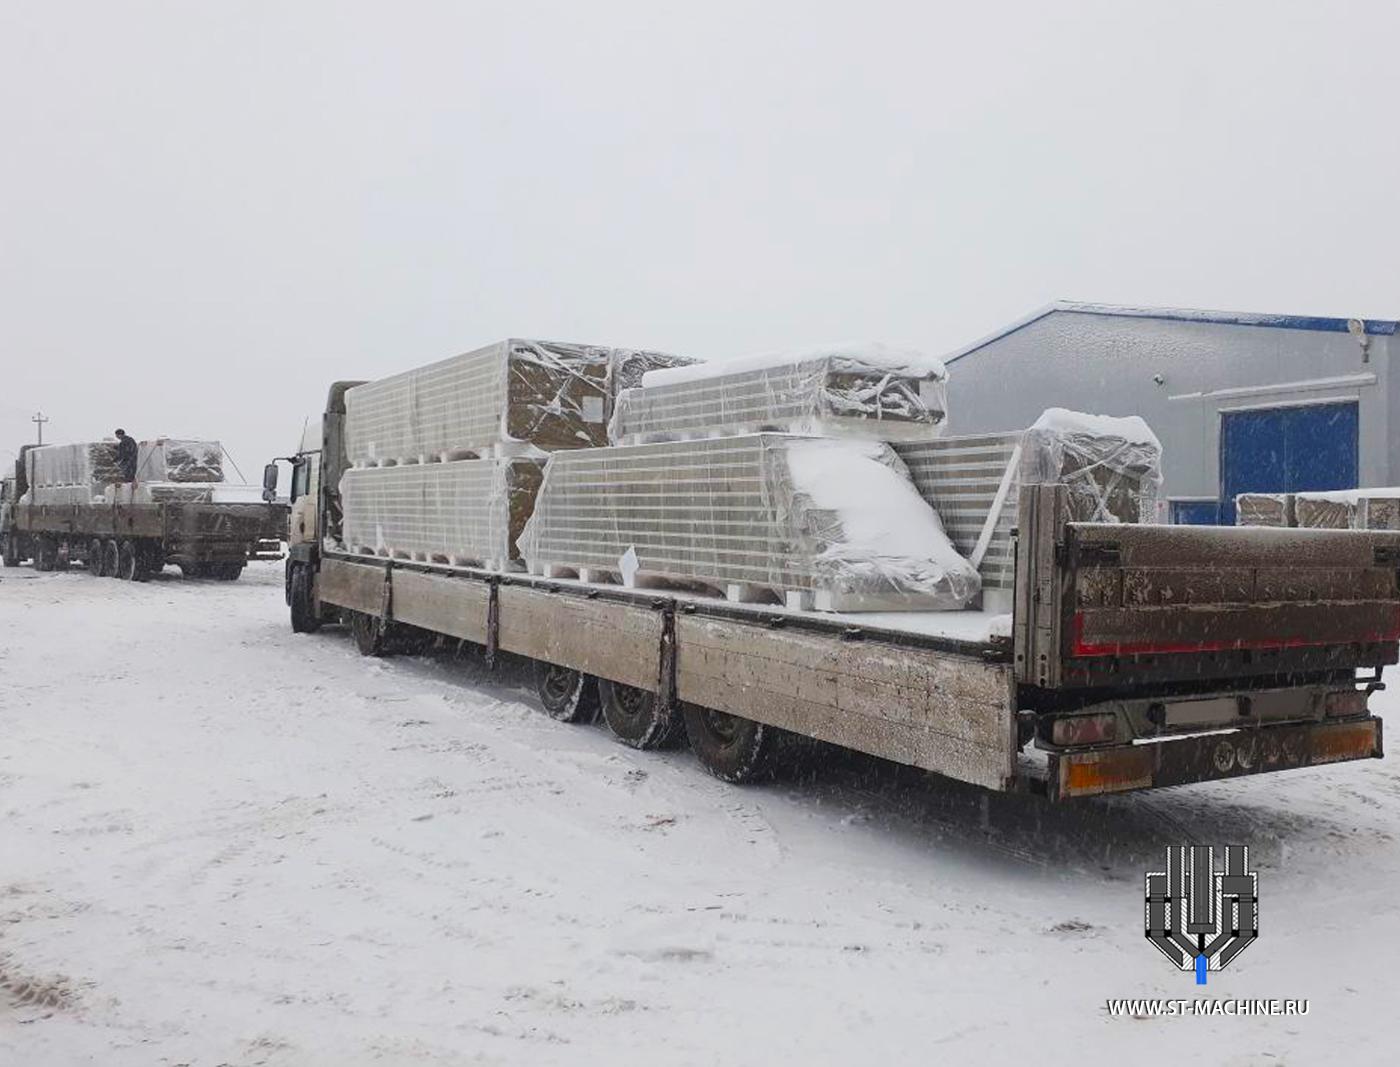 dostavka-konstrukzii-stroika-zeh--na-zakaz-st-machine.ru.jpg